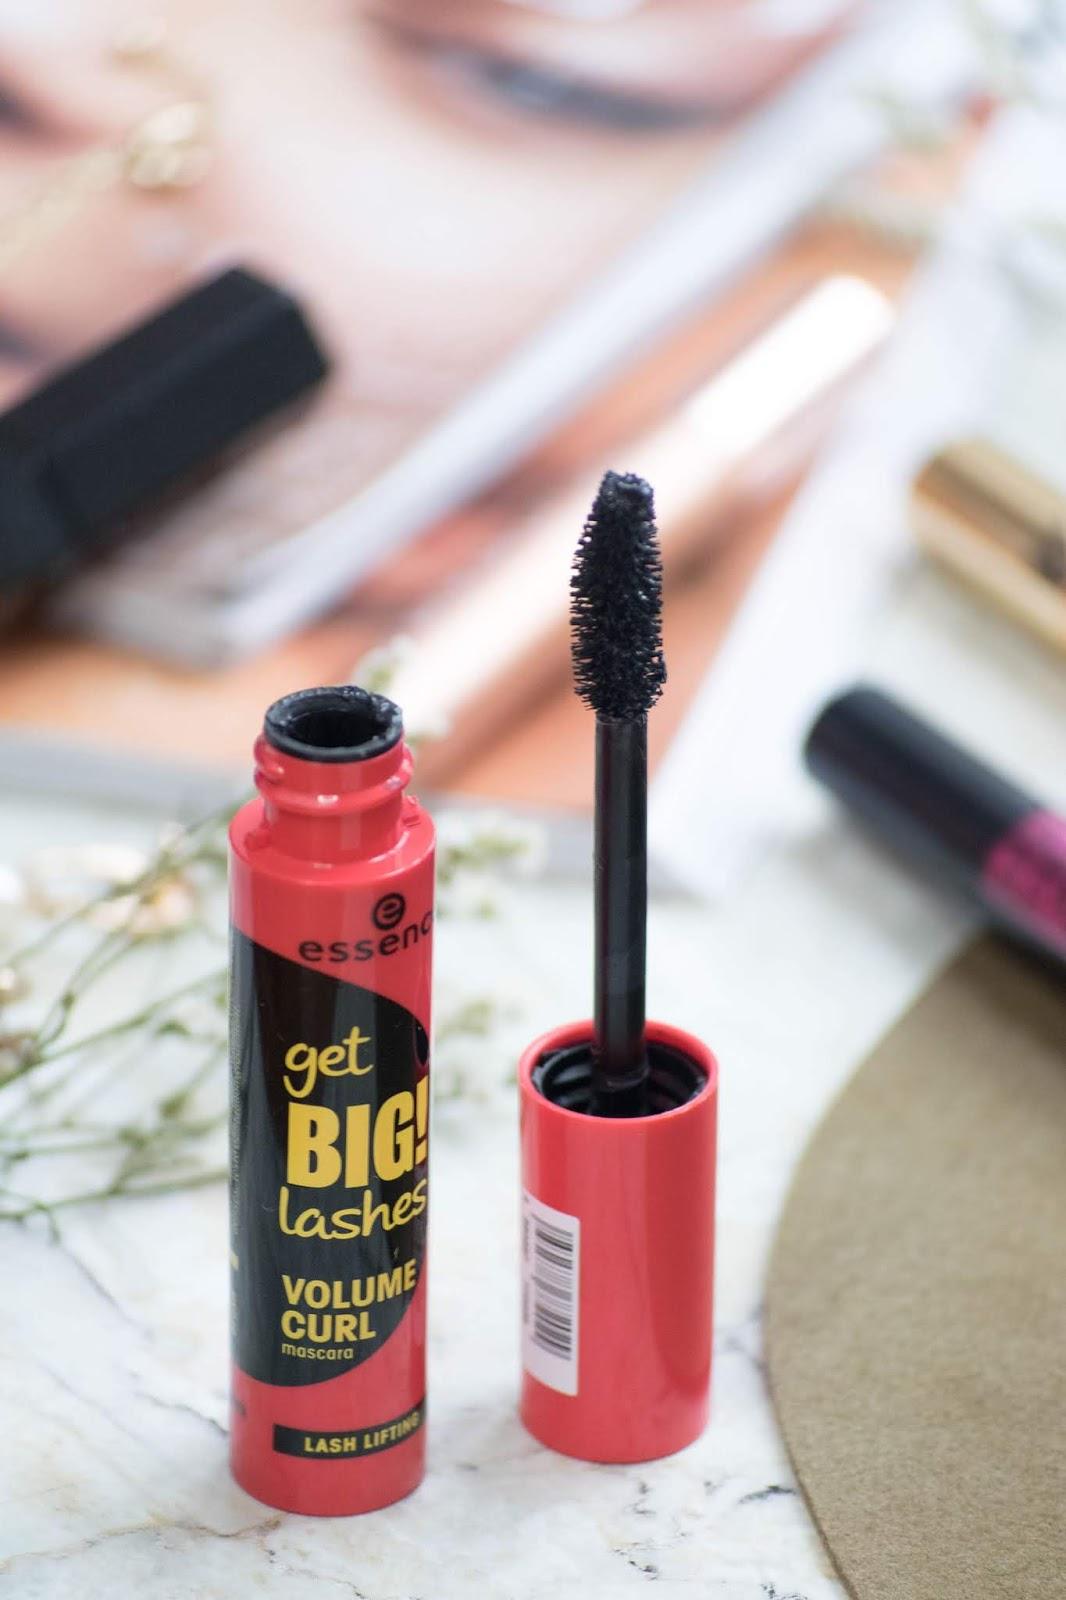 get big lashes essence